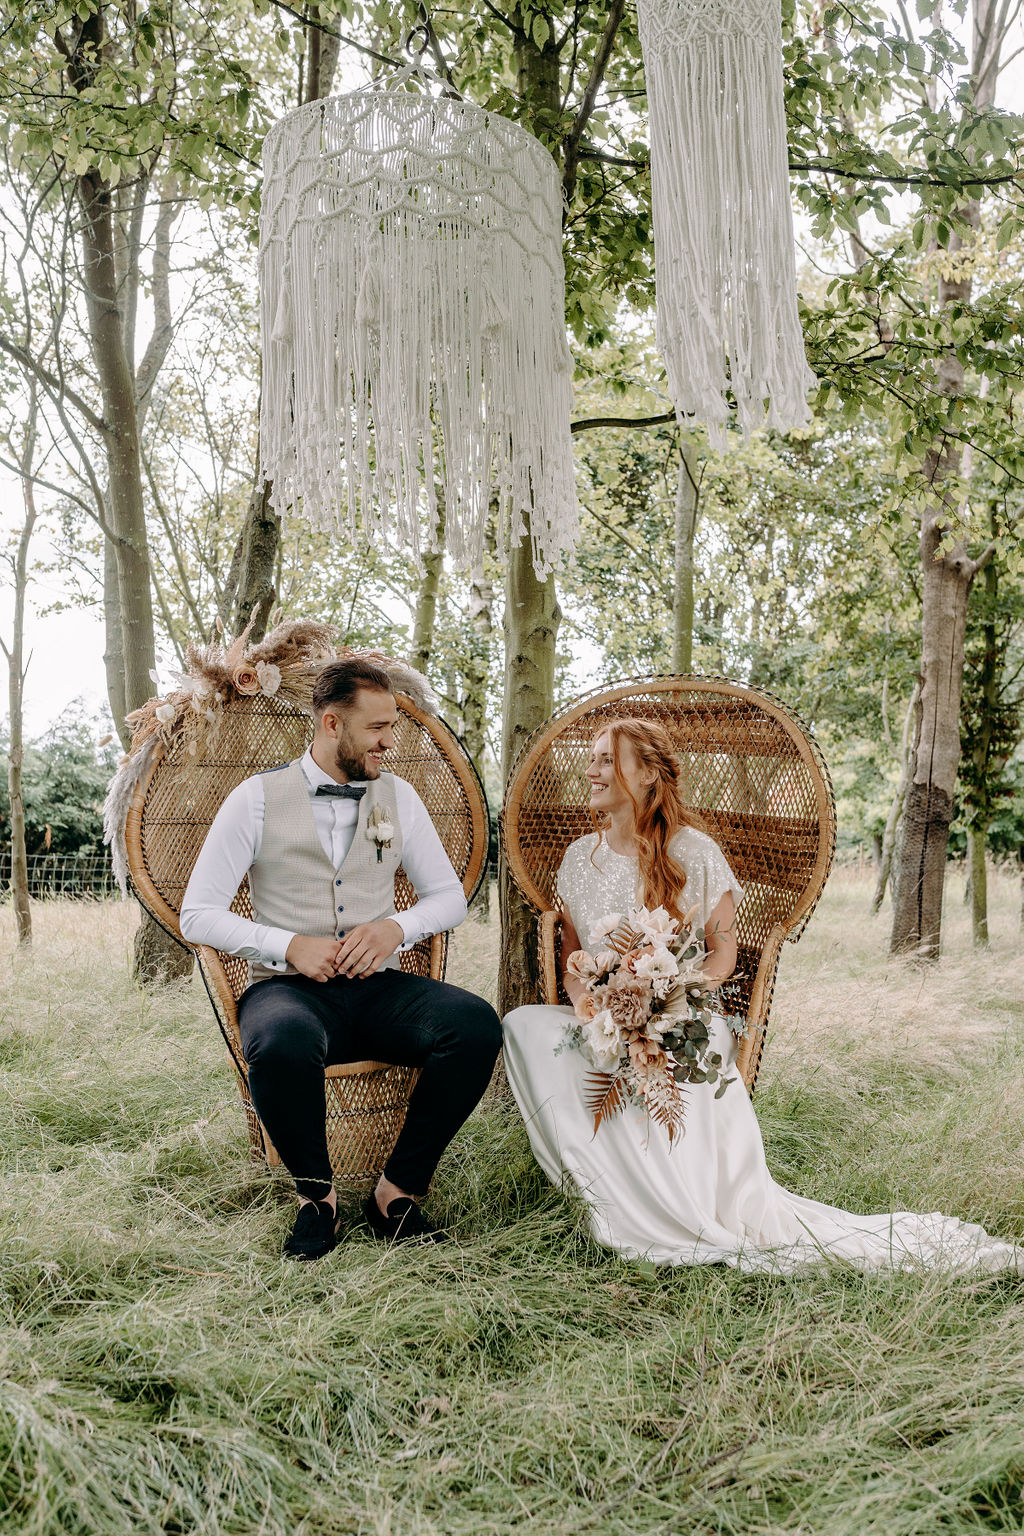 sustainable boho wedding - bohemian wedding - boho micro wedding - vintage wedding props - wicker wedding chairs - unconventional wedding